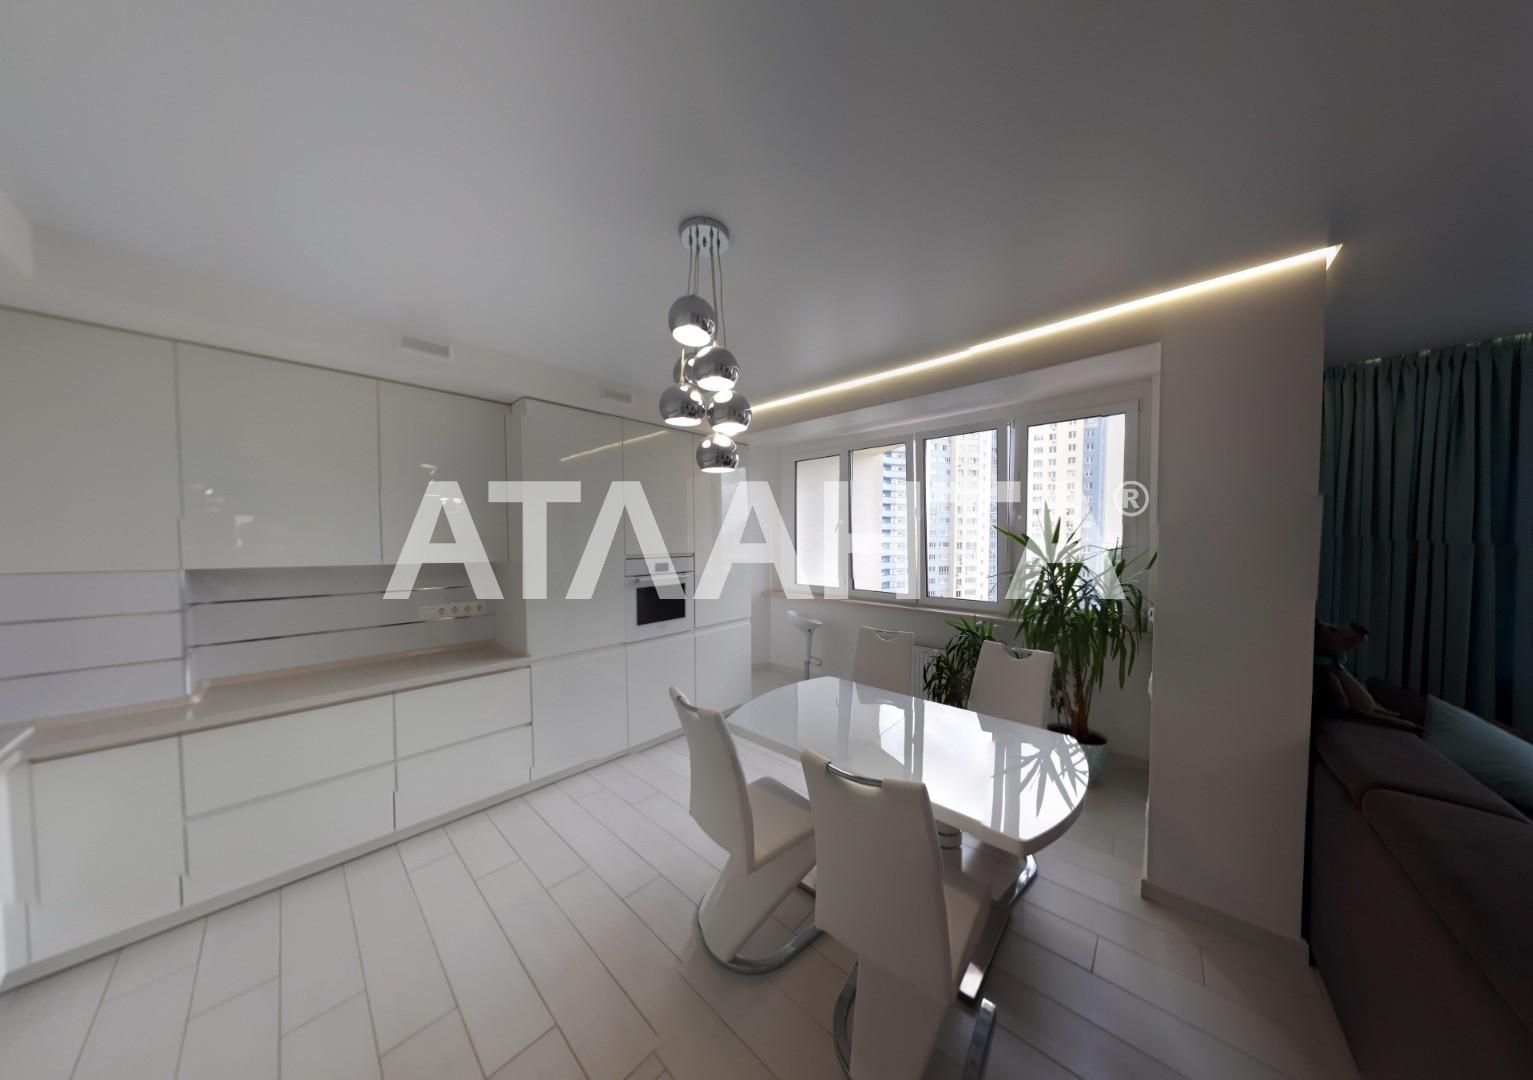 Продается 3-комнатная Квартира на ул. Просп. Глушкова — 160 000 у.е. (фото №27)